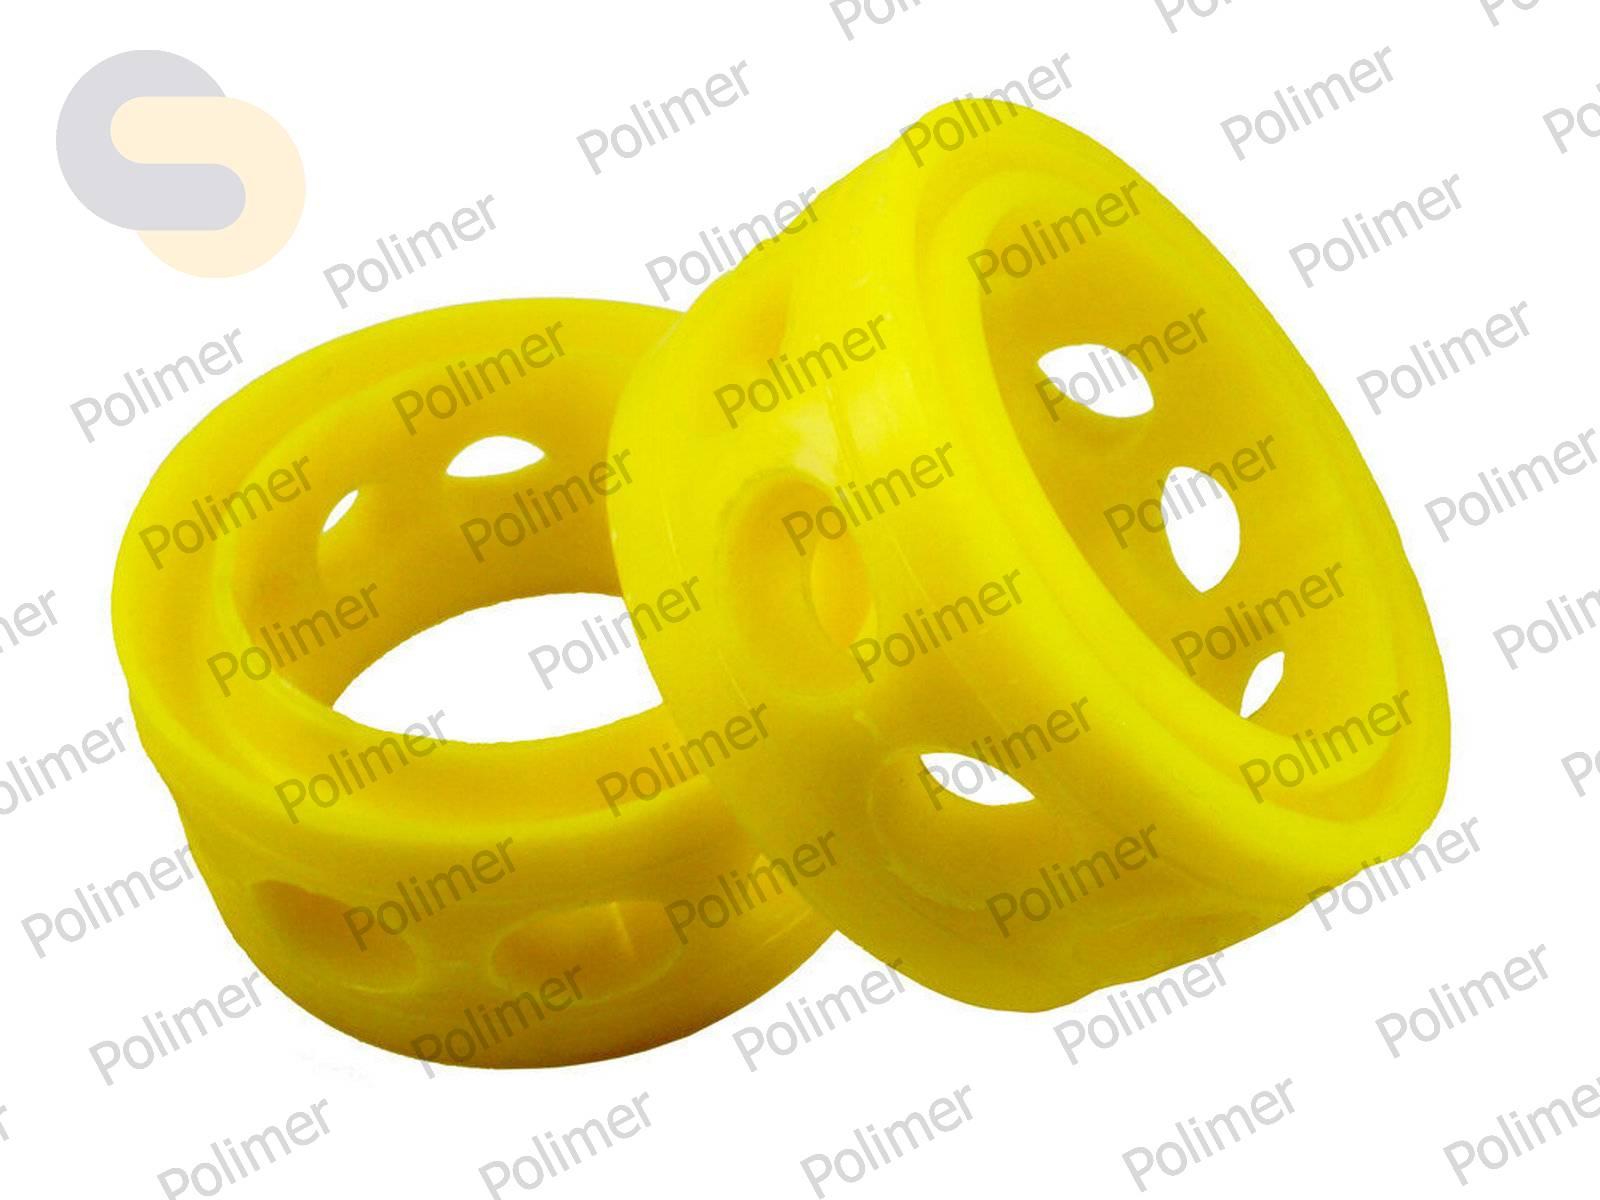 http://polimer-nsk.ru/web/pkl/Size-E-POLY.jpg